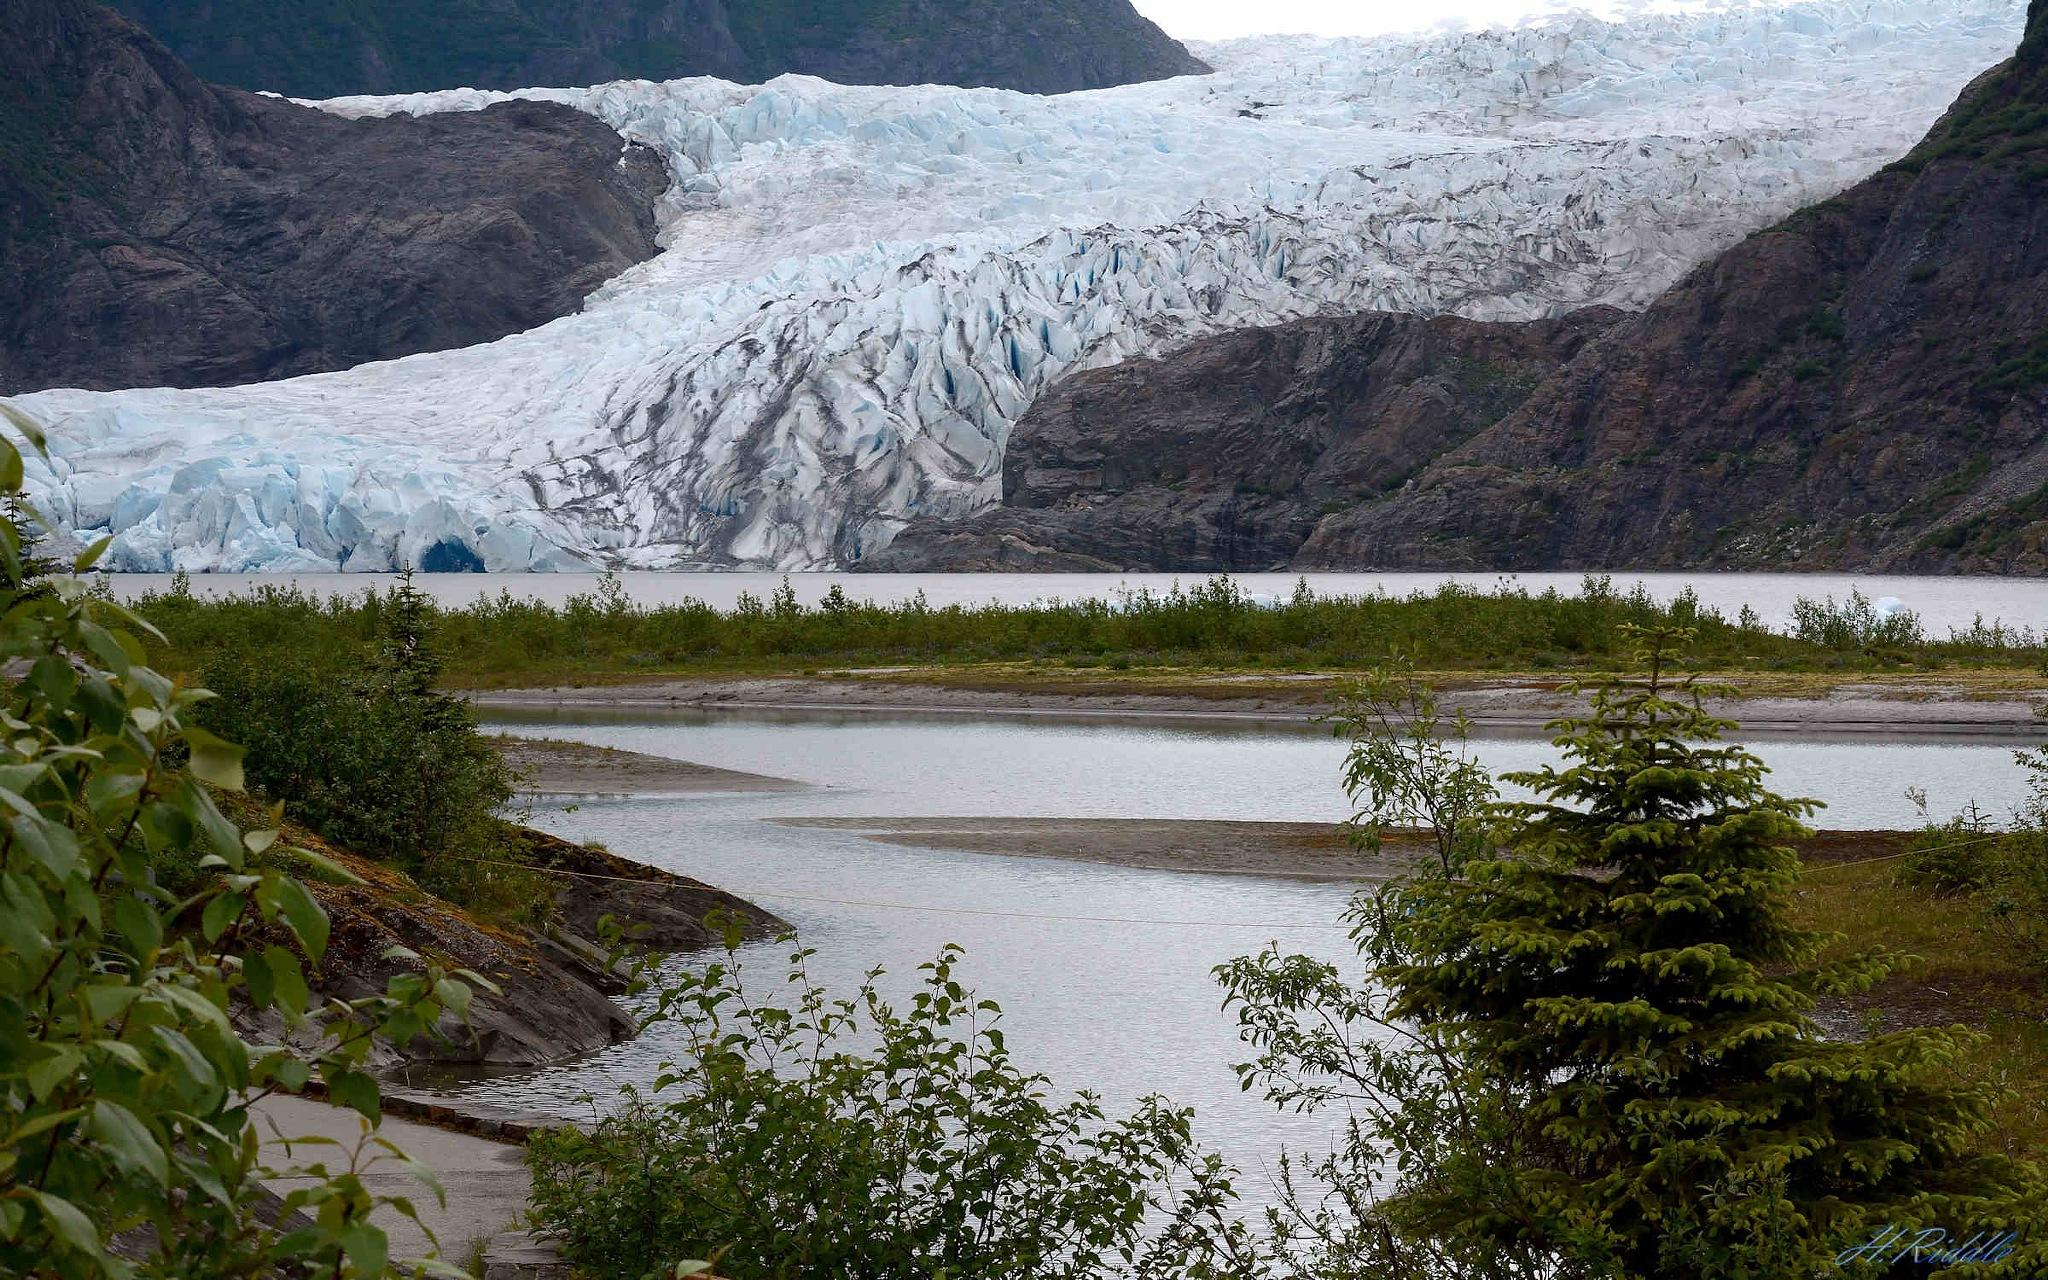 Mendenhall Glacier, Alaska by Herb Riddle